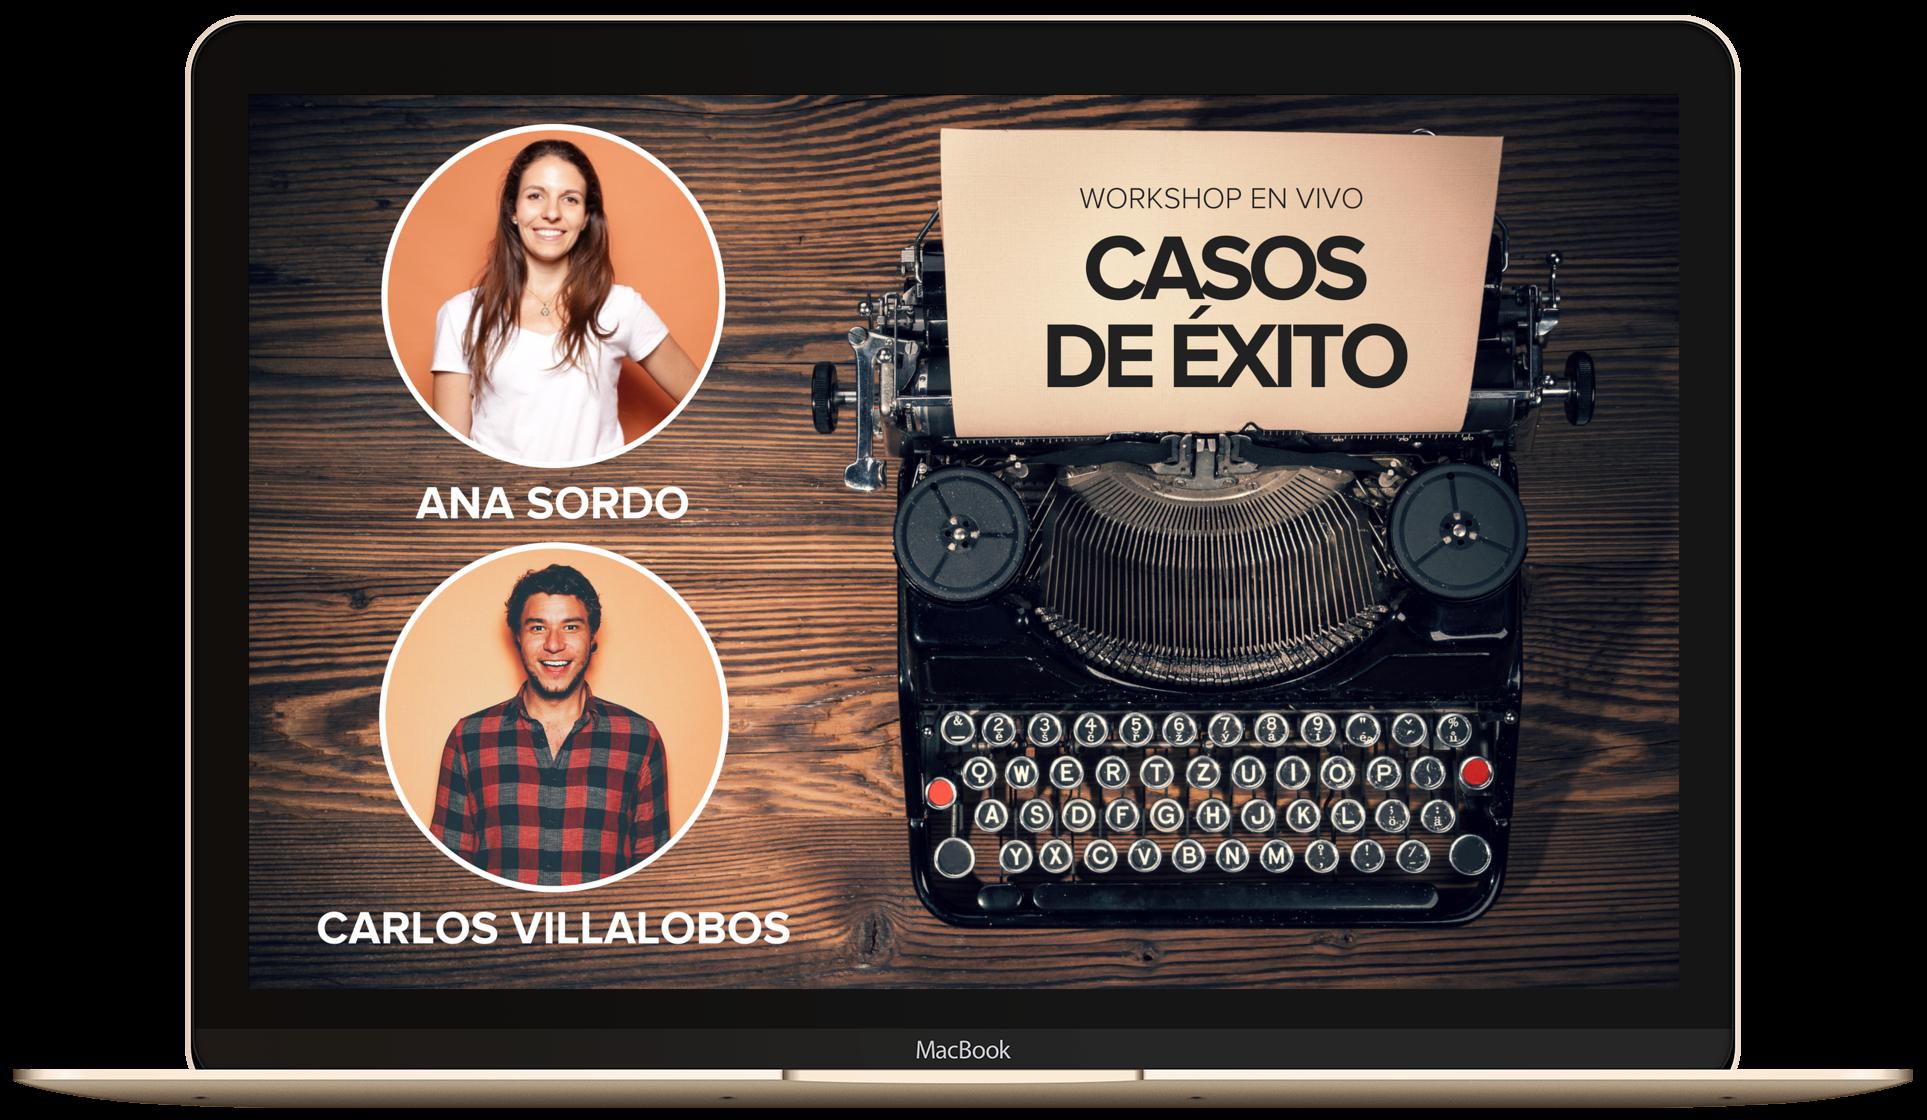 MIS CASOSDE ÉXITOS (1)_macbookgold_front.png